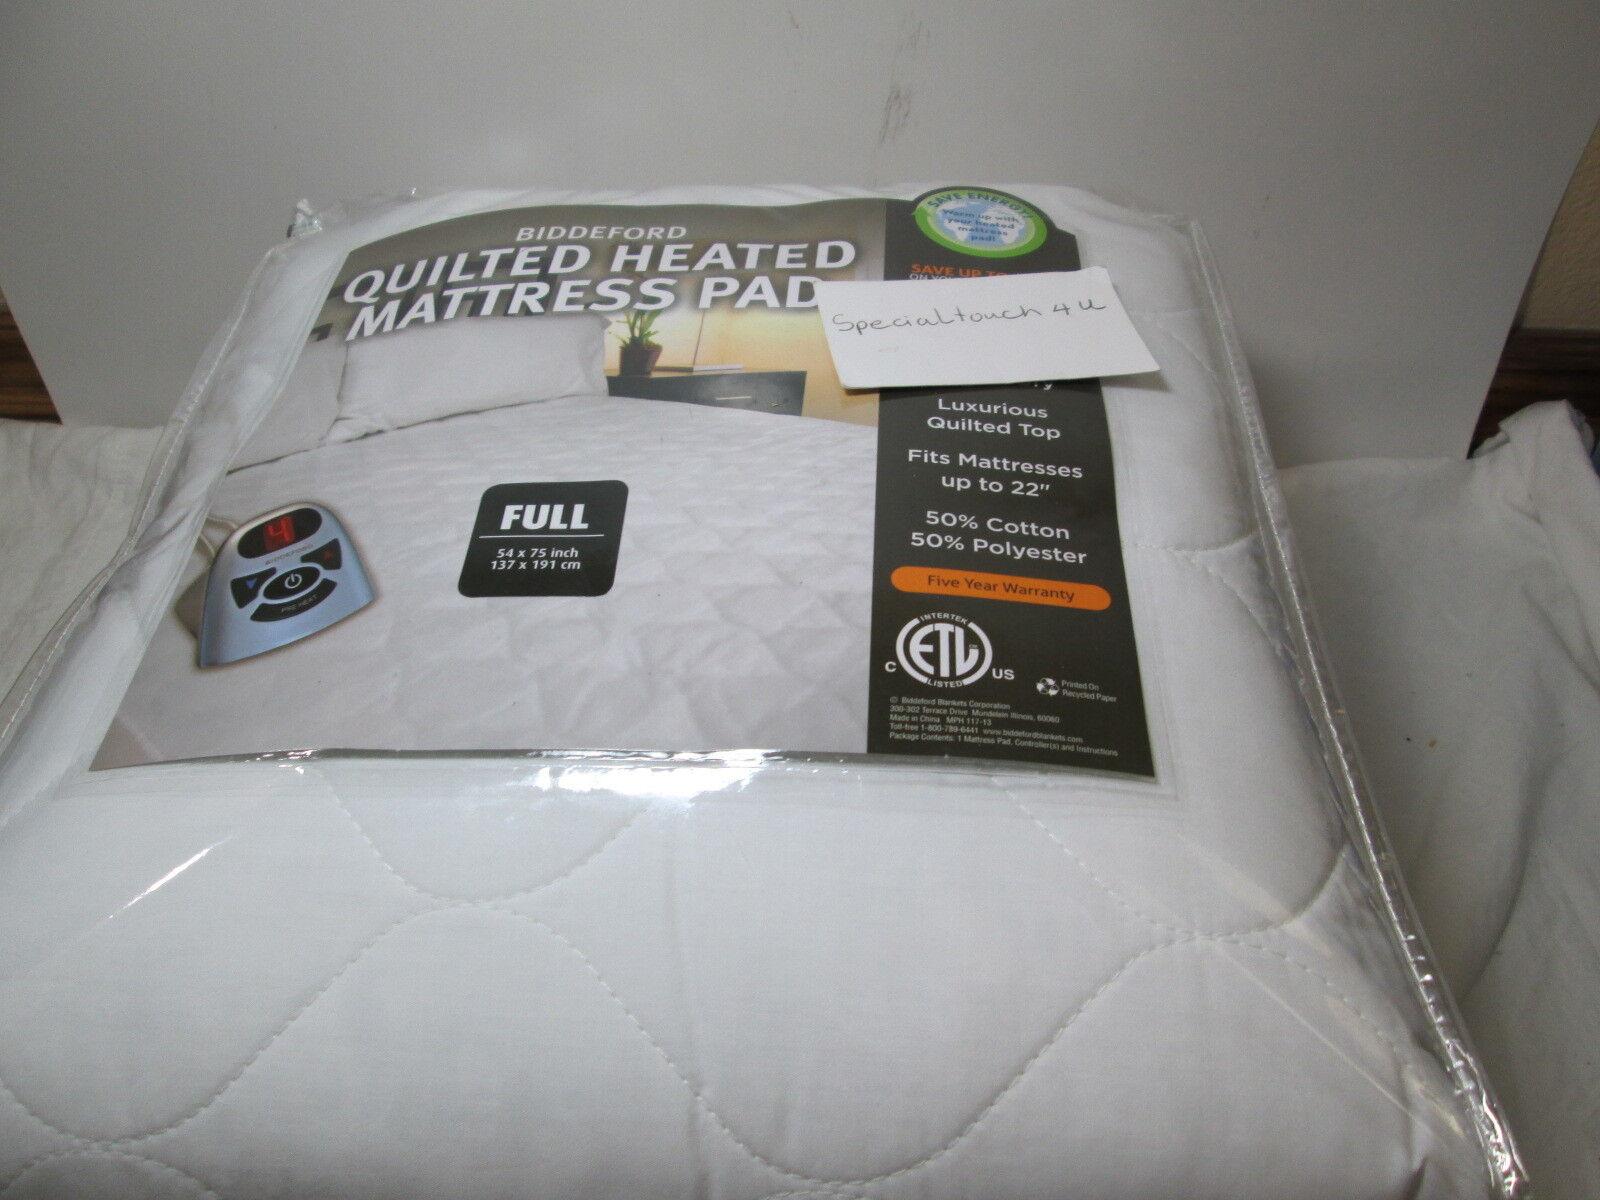 New Biddeford Full Quilted Heated Mattress Pad  - 10 Hour Auto Shut Off - Weiß